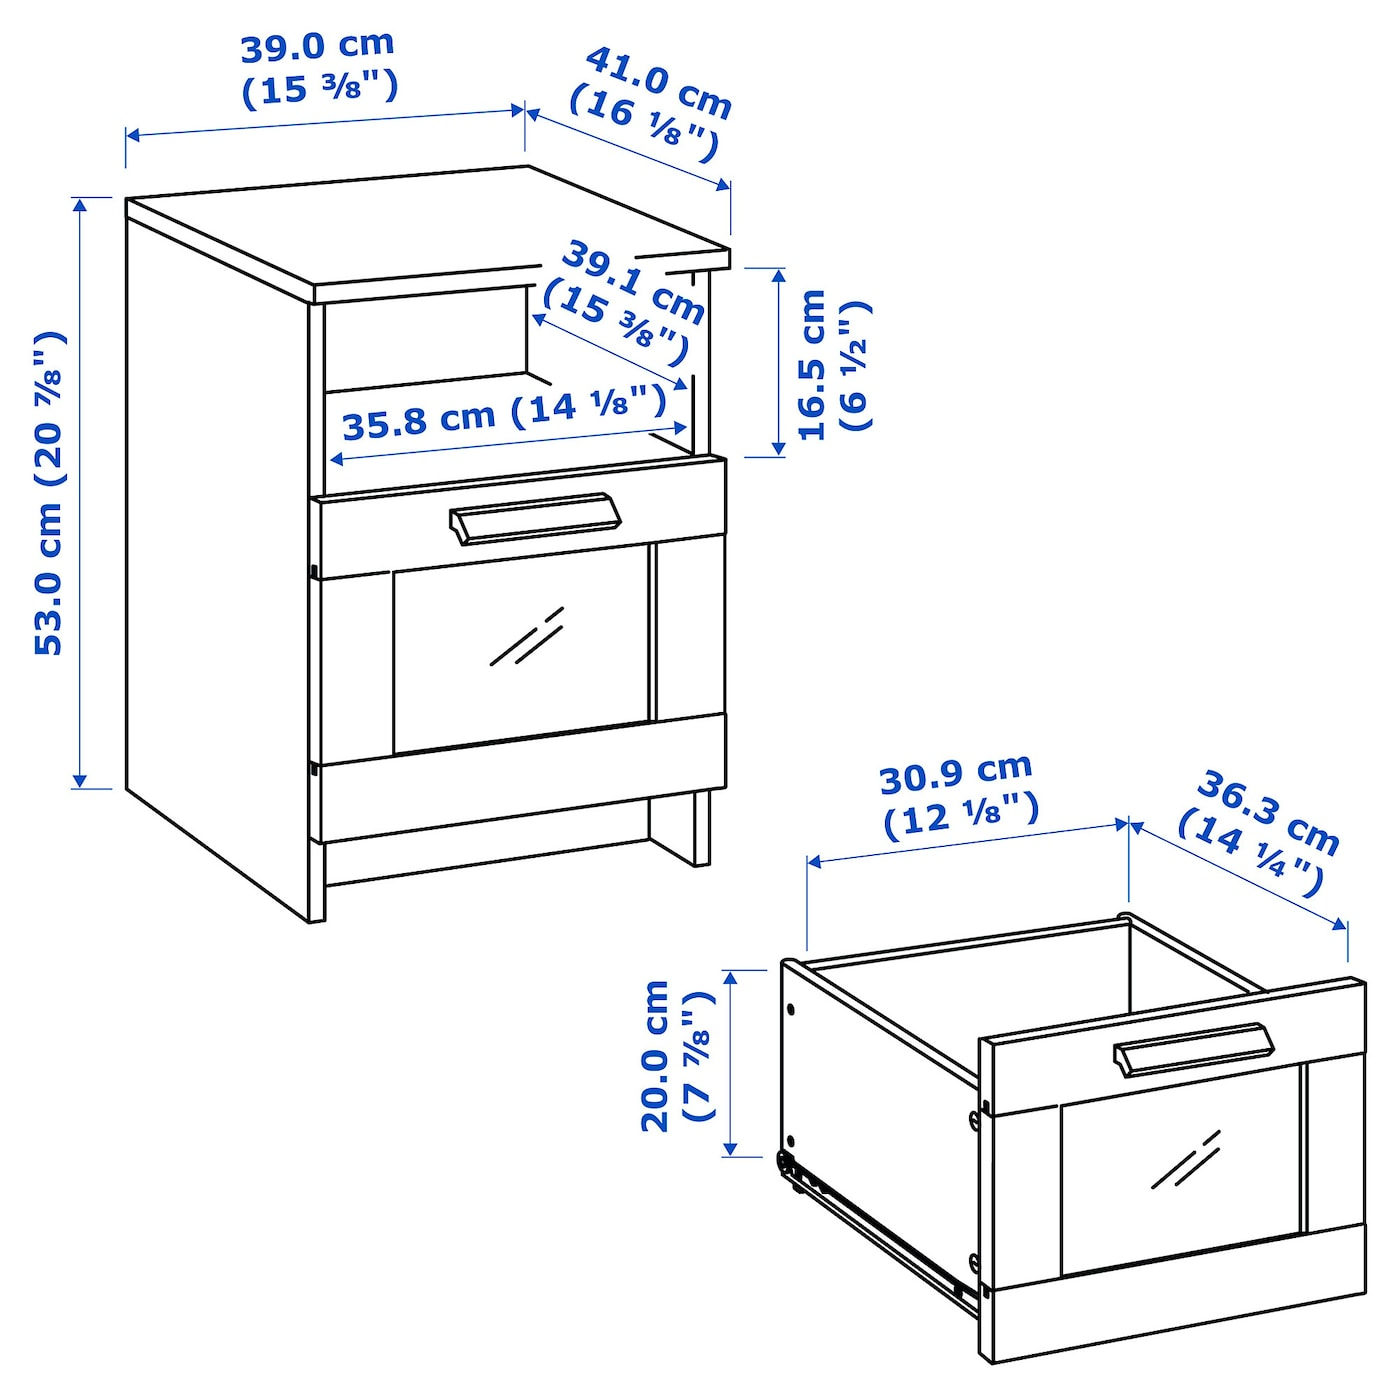 BRIMNES white, Bedside table, 39x41 cm